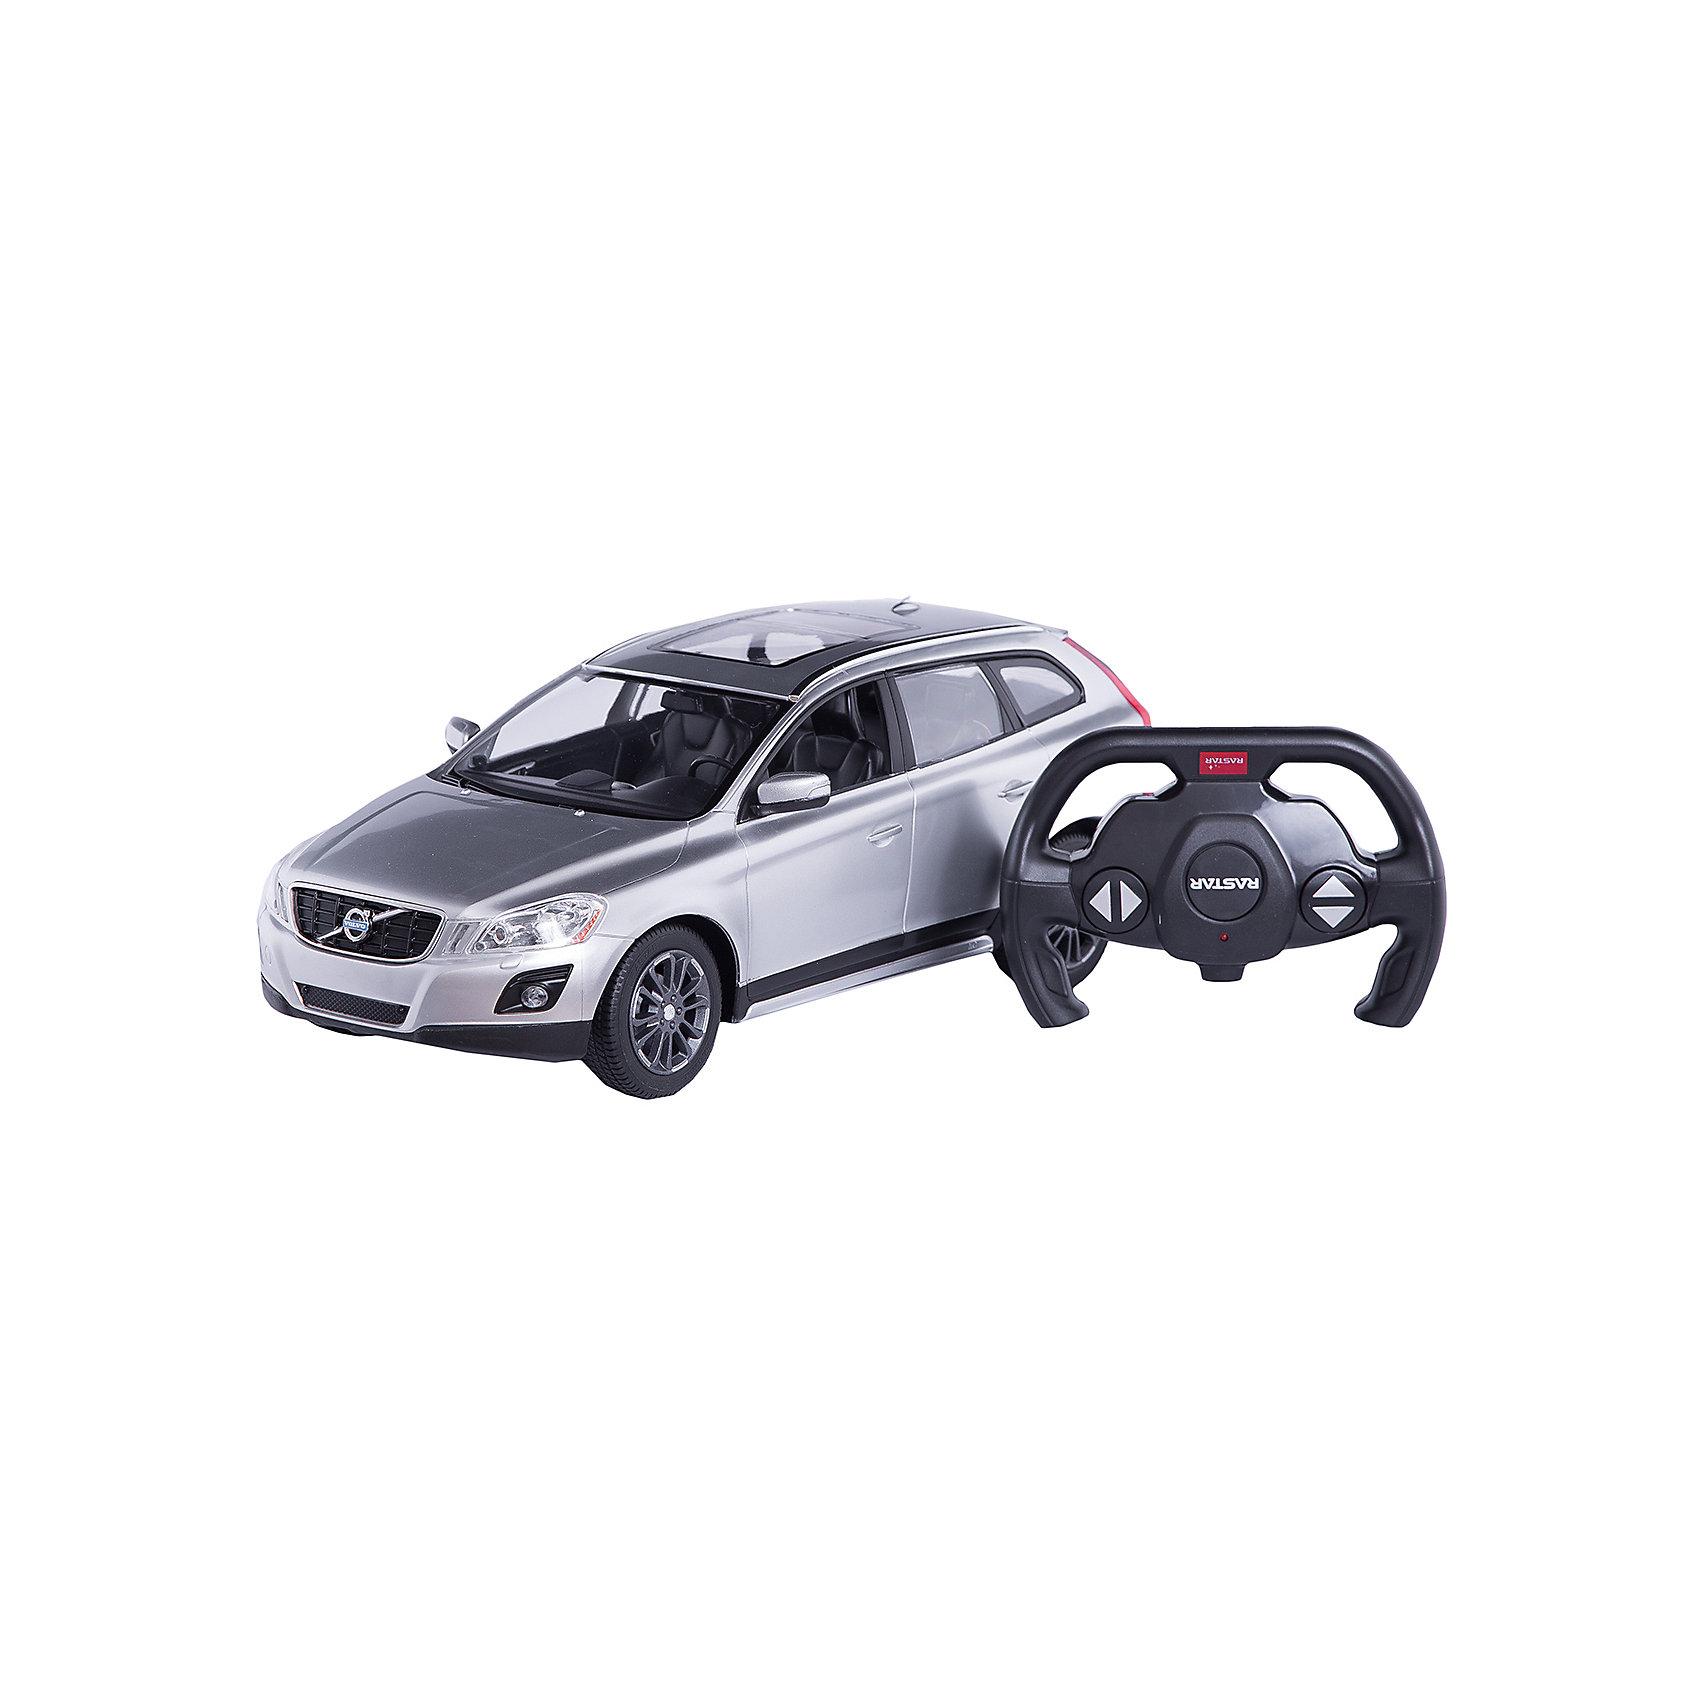 Радиоуправляемая машина Volvo XC60 1:14, Rastar, серебрянаяРадиоуправляемый транспорт<br><br><br>Ширина мм: 455<br>Глубина мм: 215<br>Высота мм: 195<br>Вес г: 1380<br>Возраст от месяцев: 72<br>Возраст до месяцев: 2147483647<br>Пол: Мужской<br>Возраст: Детский<br>SKU: 6767707